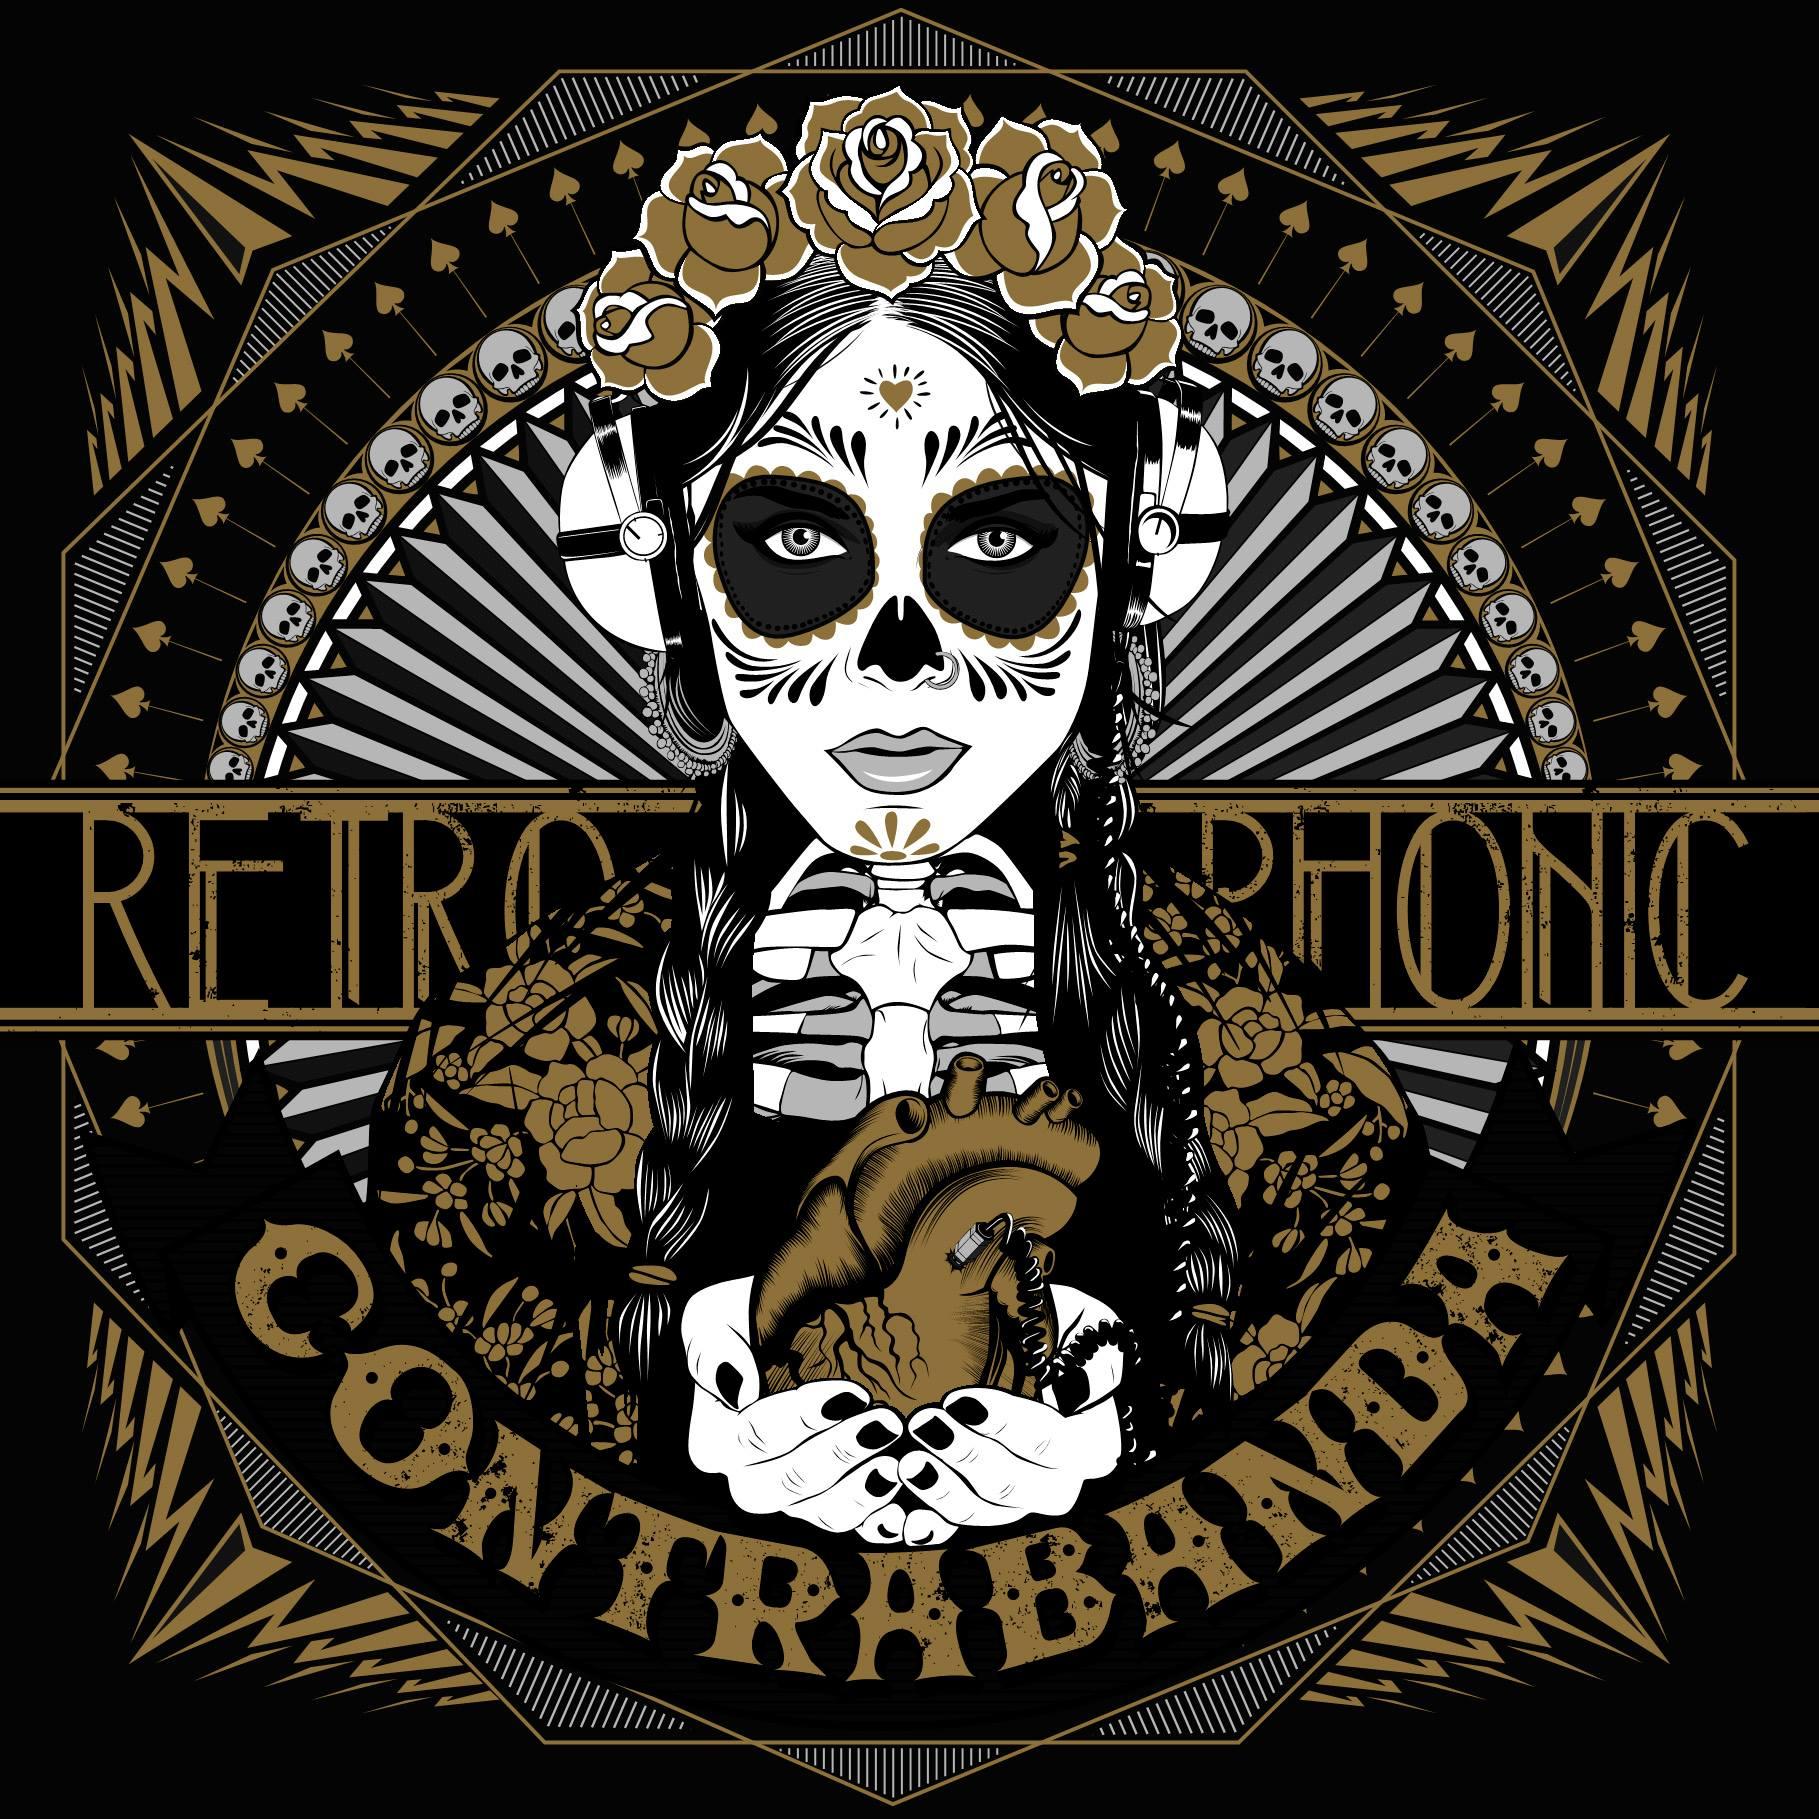 Contrabanda Retrophonic